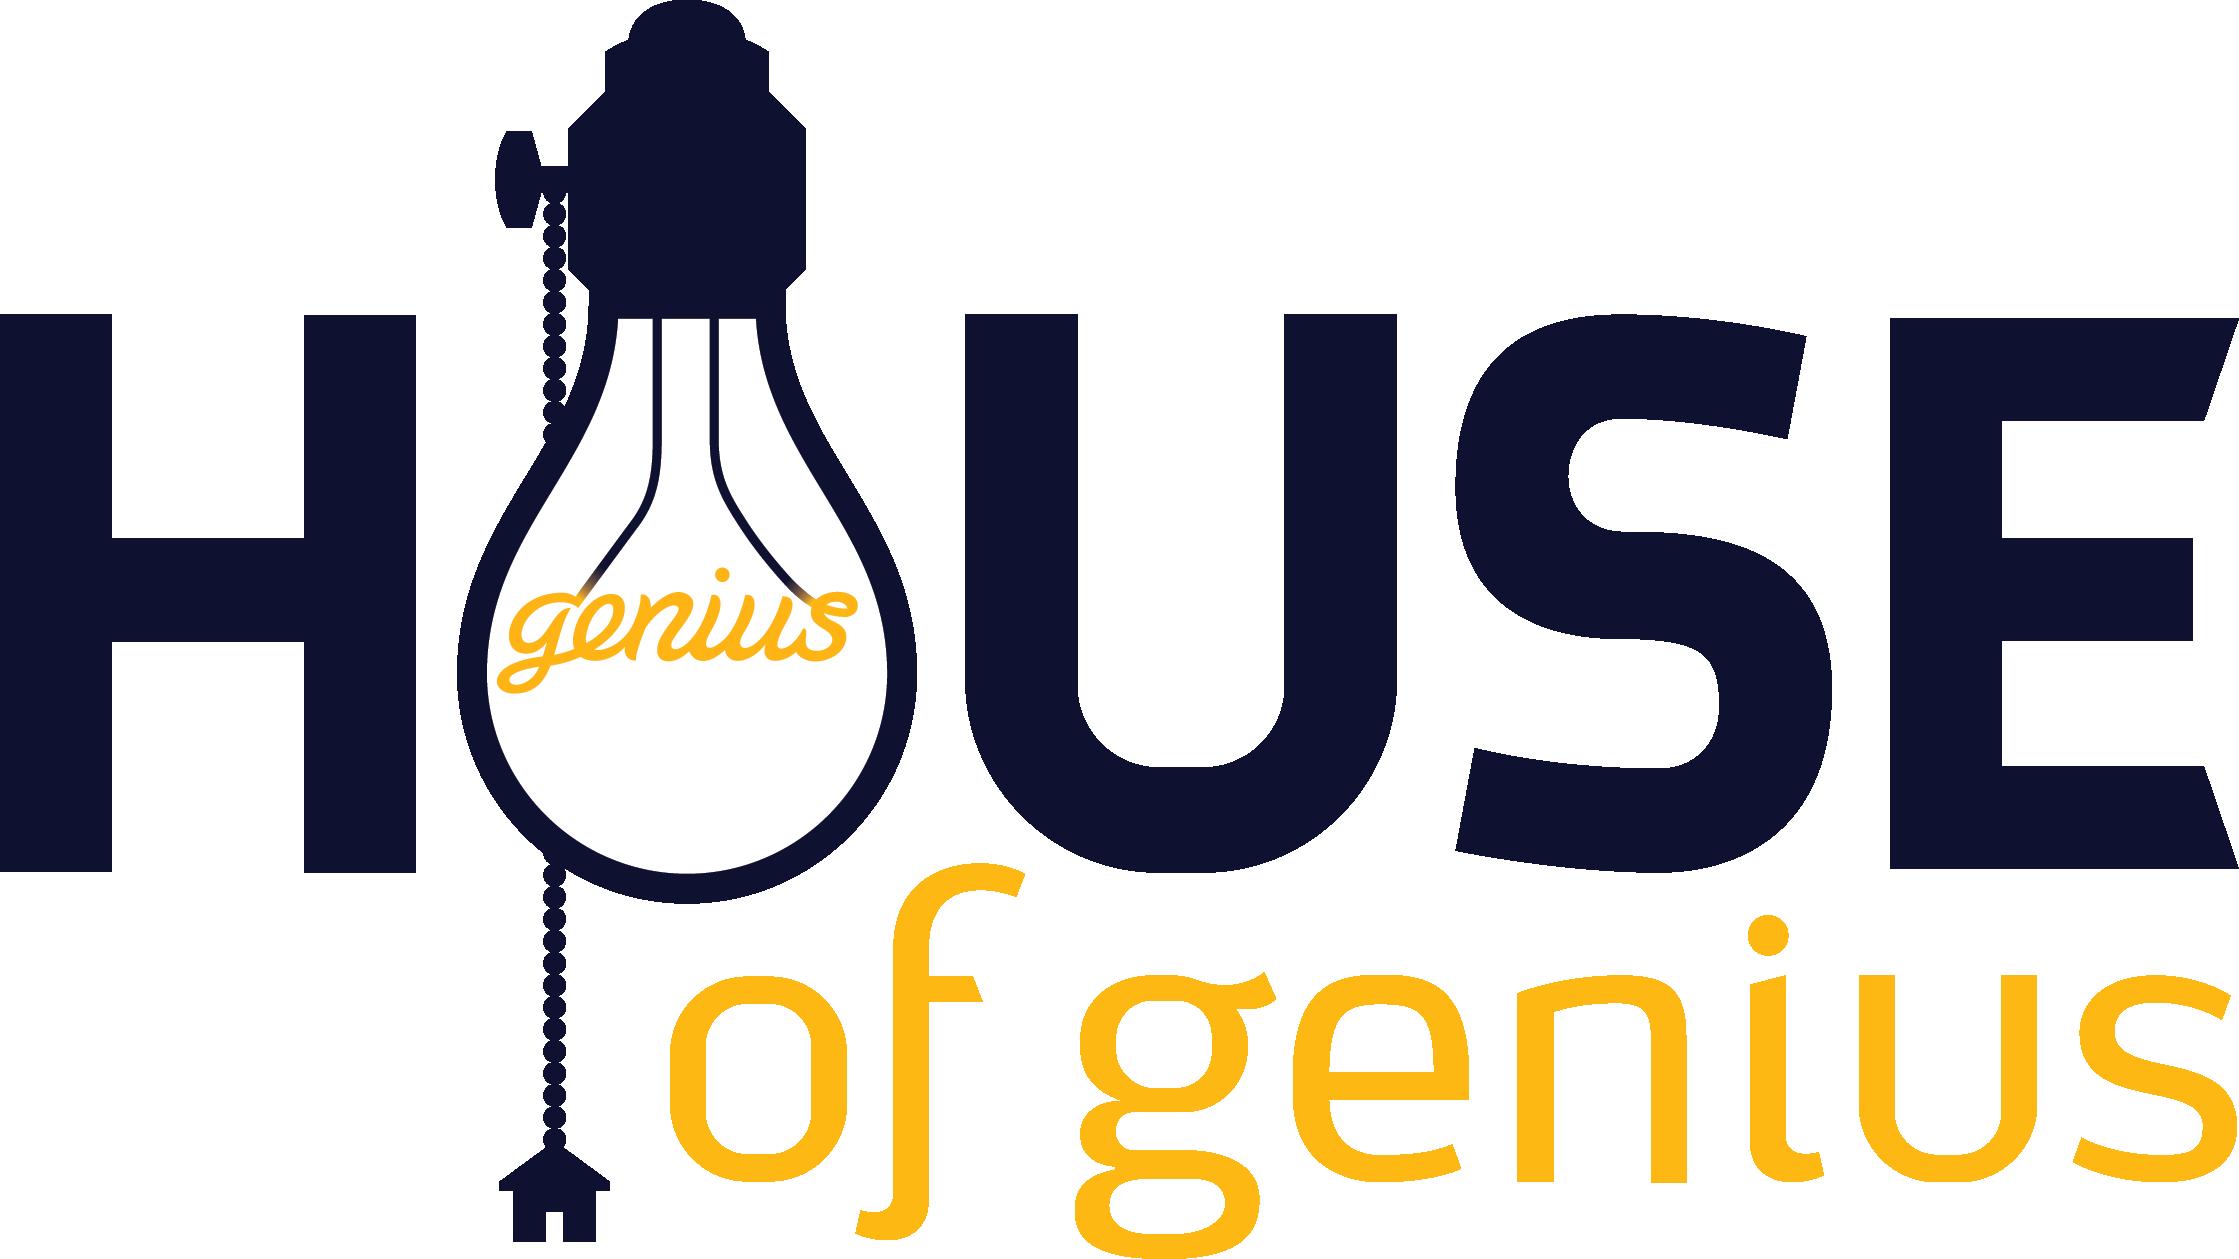 HoG_Full_Logo.png